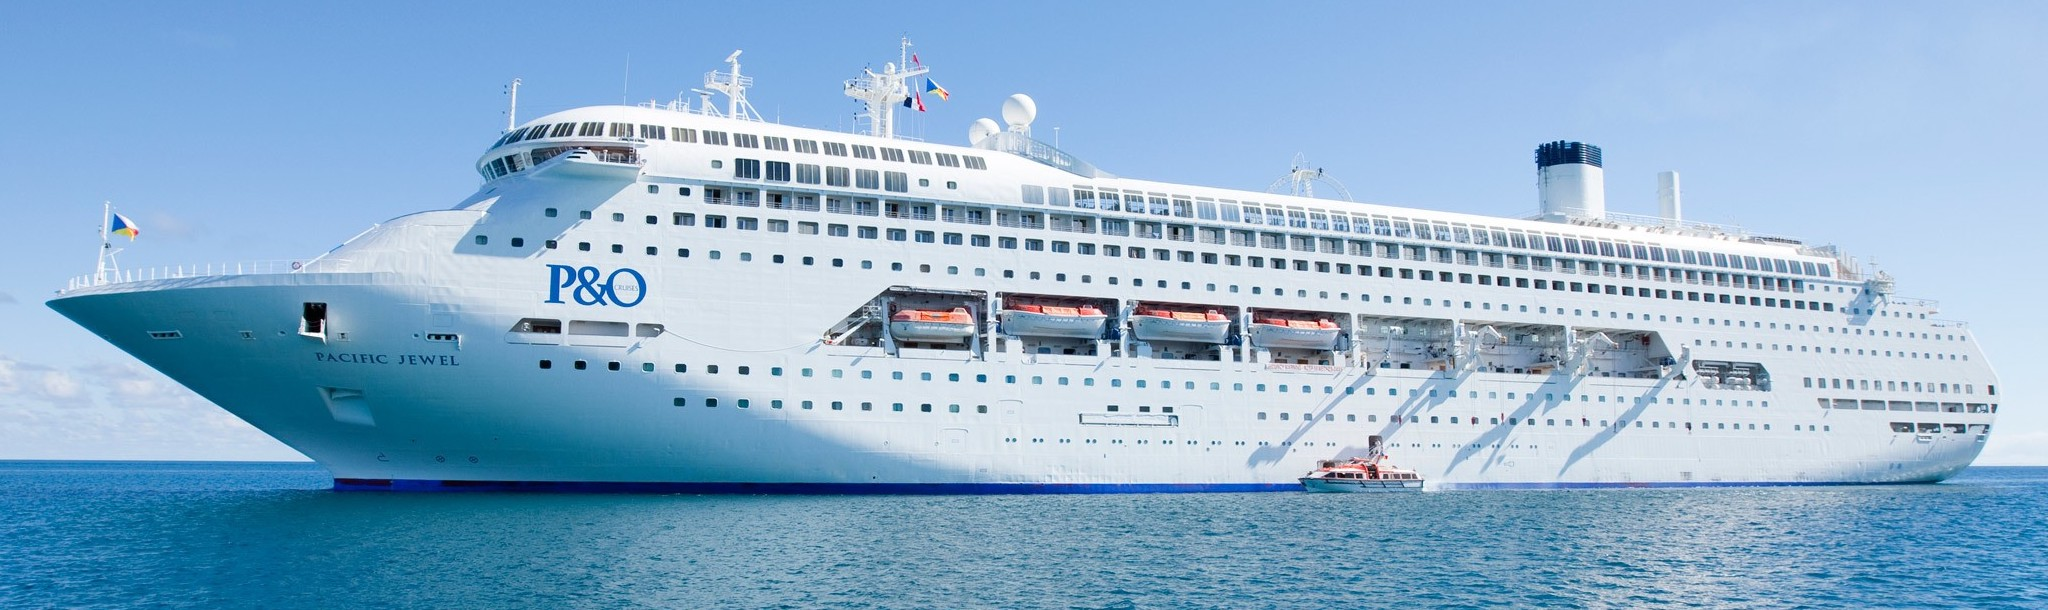 P&O announces brand new mega cruise ship built specifically for Australia